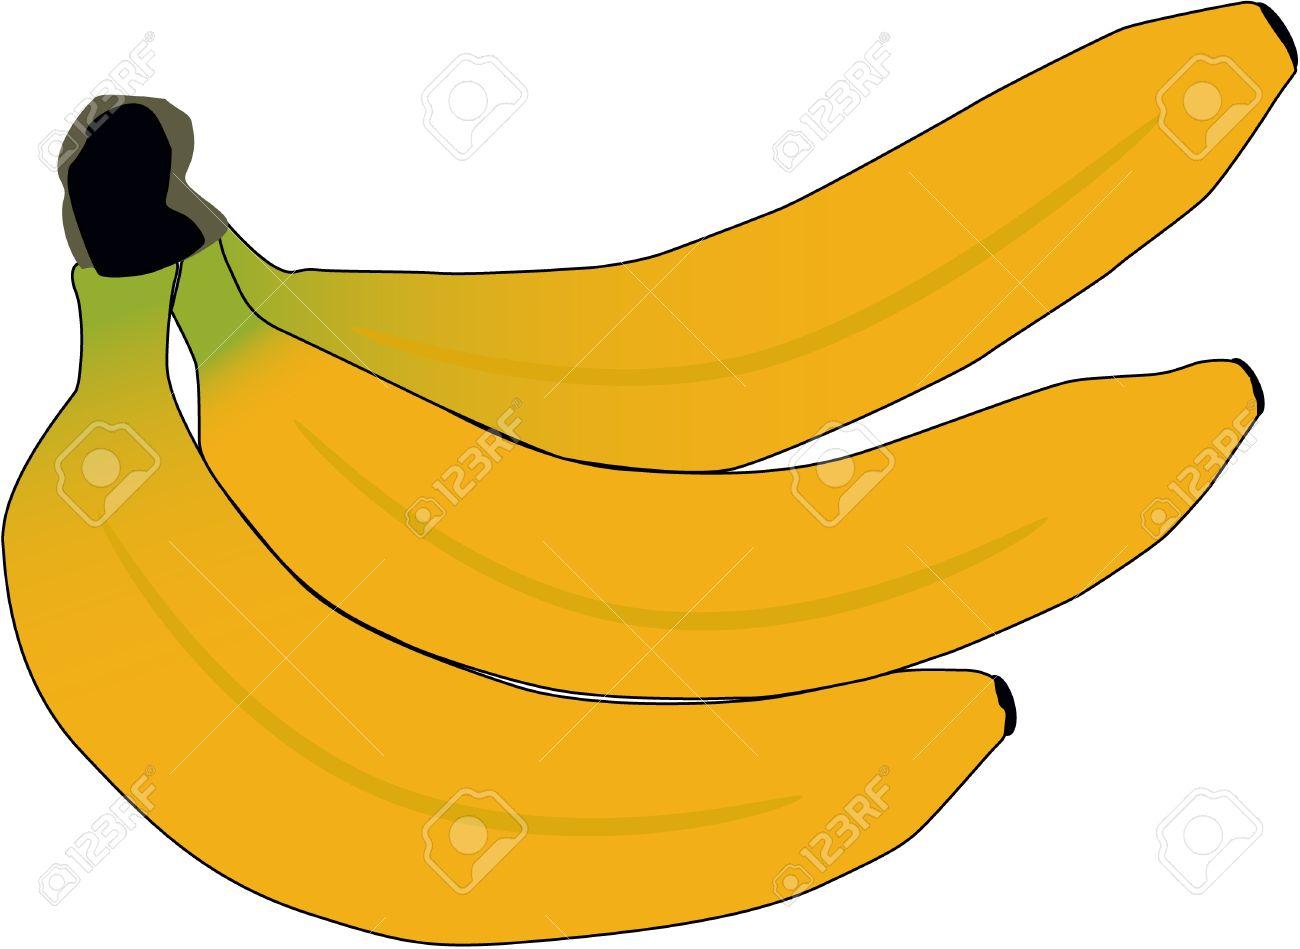 Banana, vector work Stock Vector - 9830403